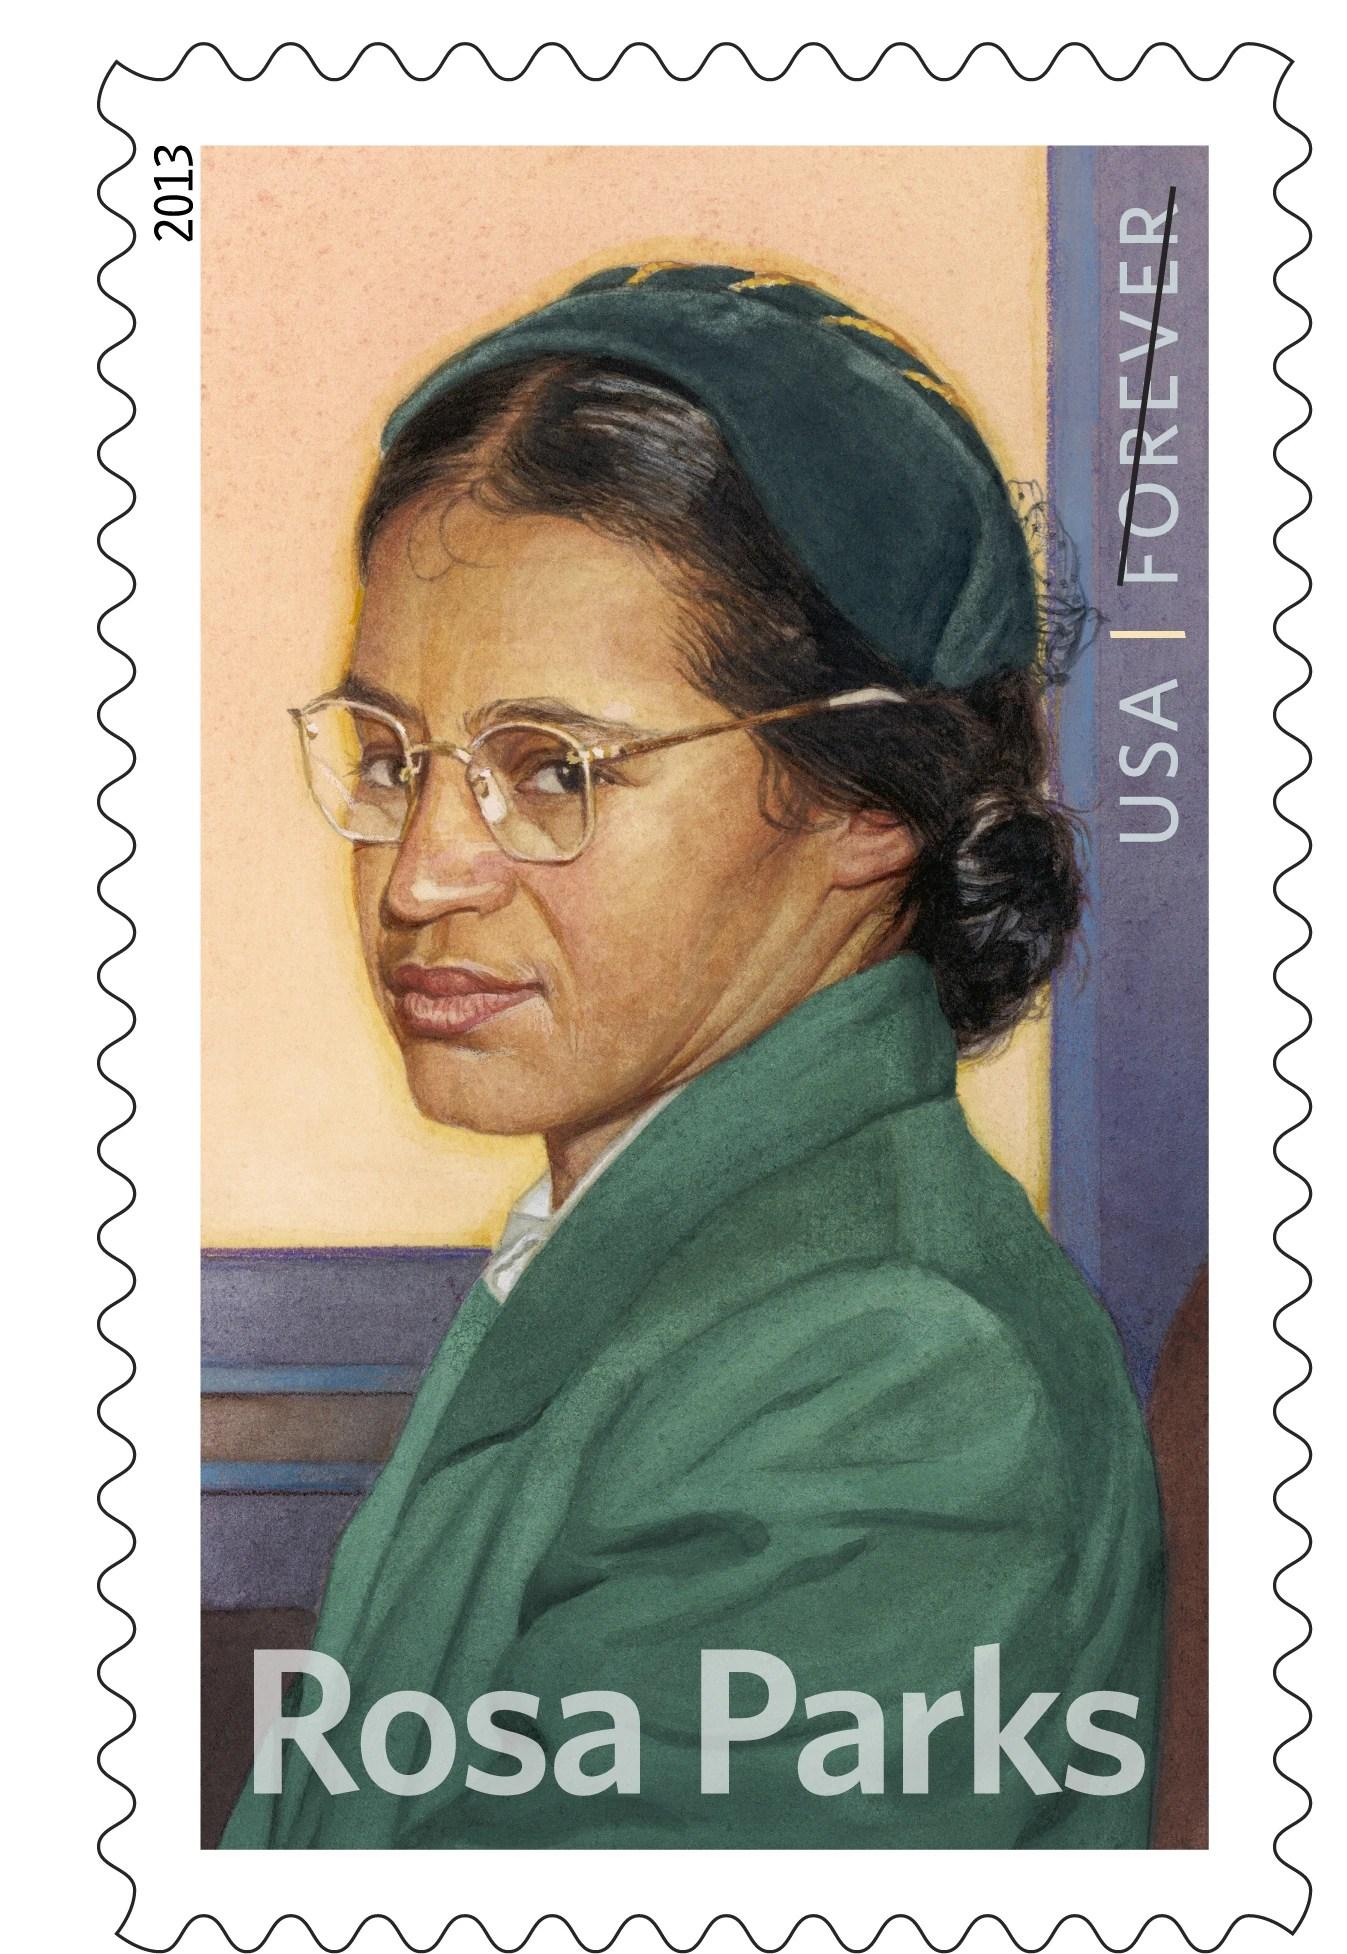 Rosa Parks S Little Protest Led To Big Change